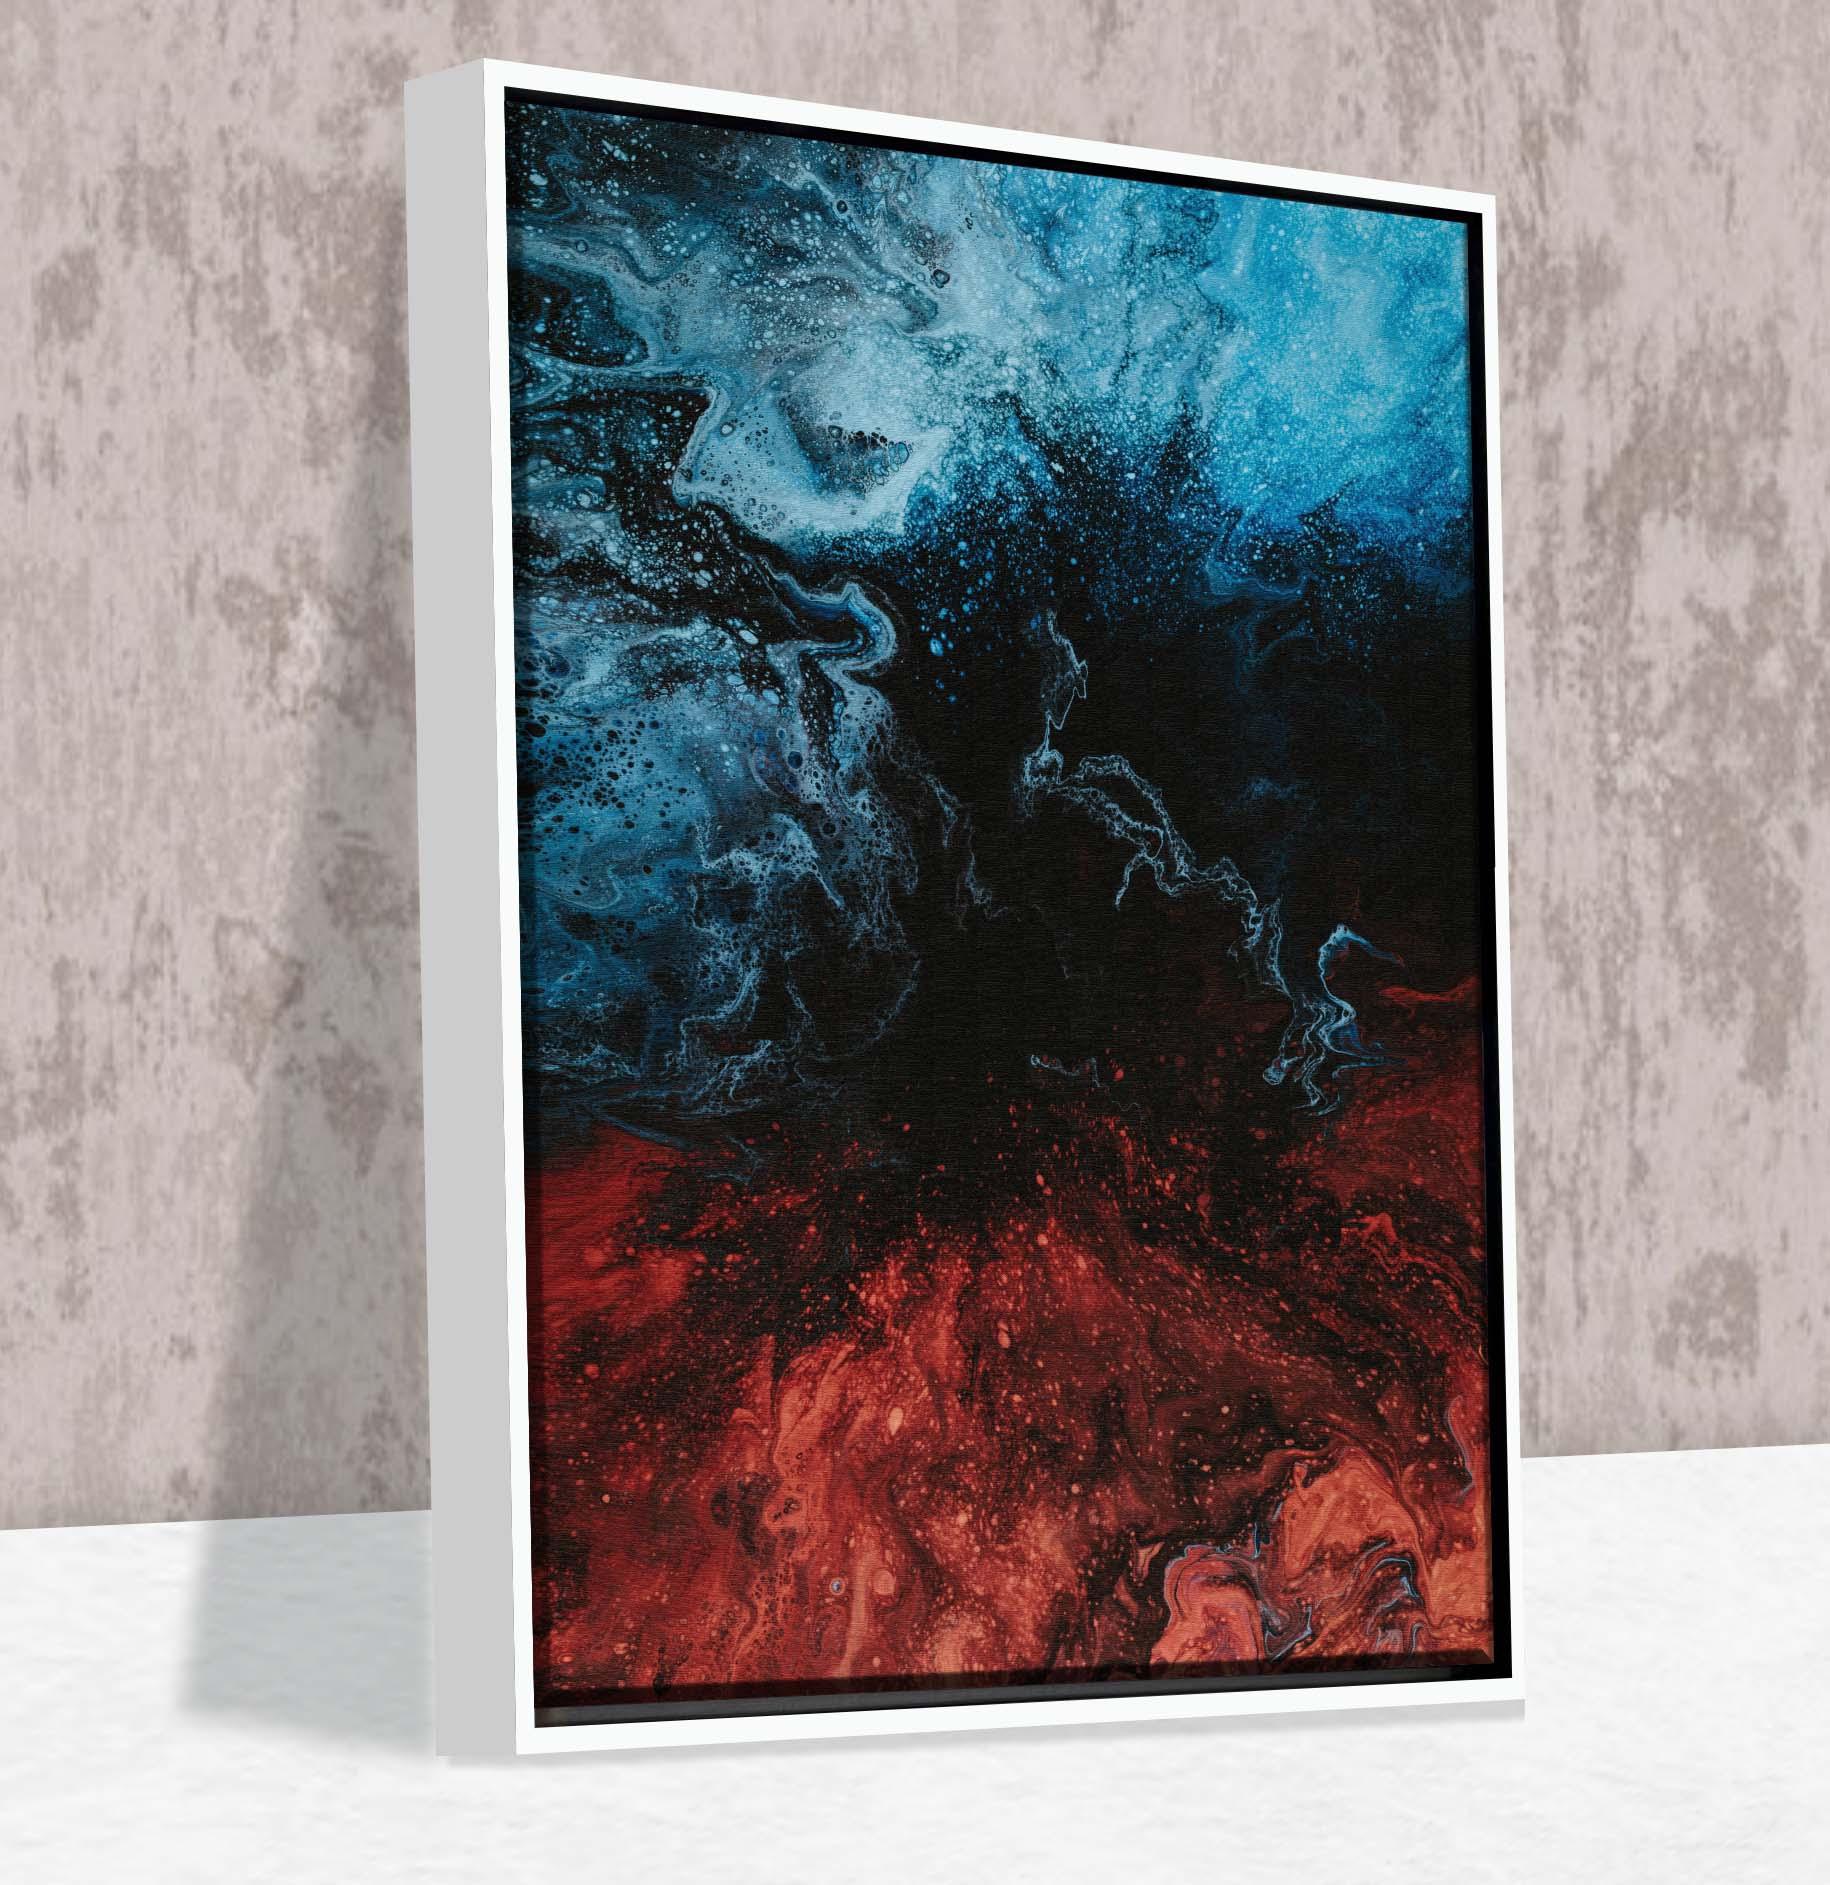 Quadro Fim Abstrato - Moldura Canaleta